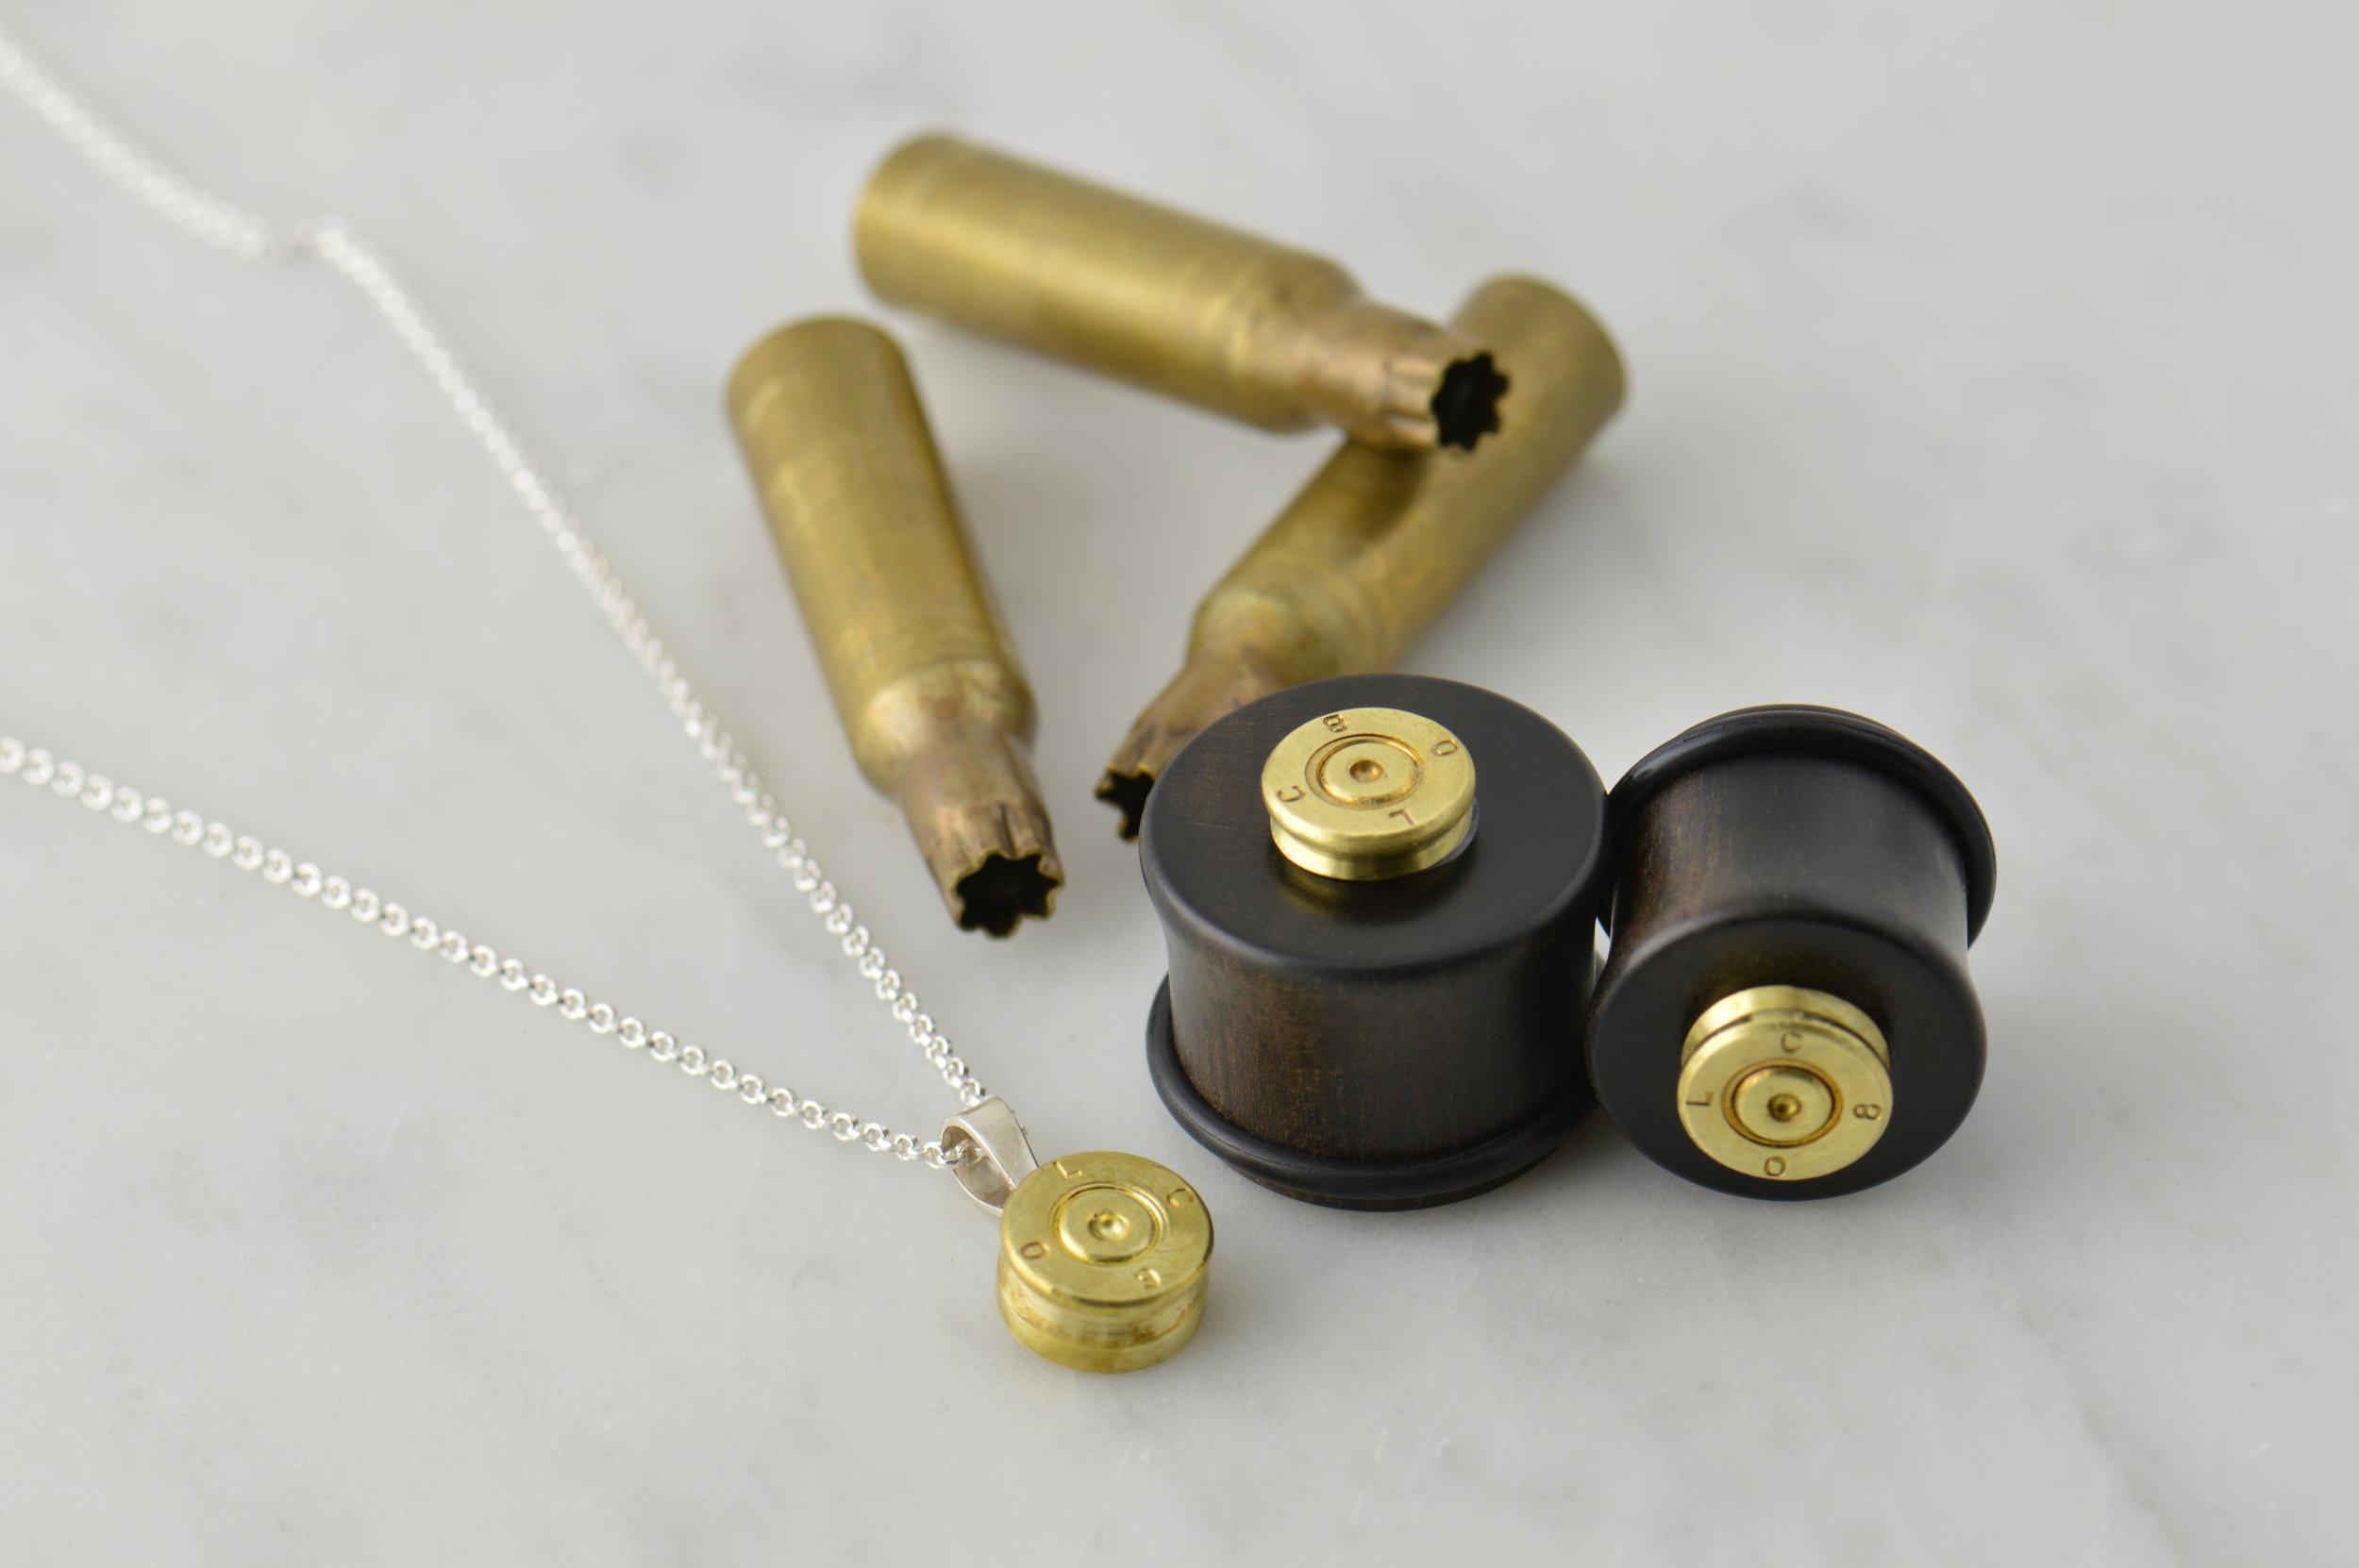 darvier-gauge-rifle-casing-wood-ear-plugs-necklace.jpg